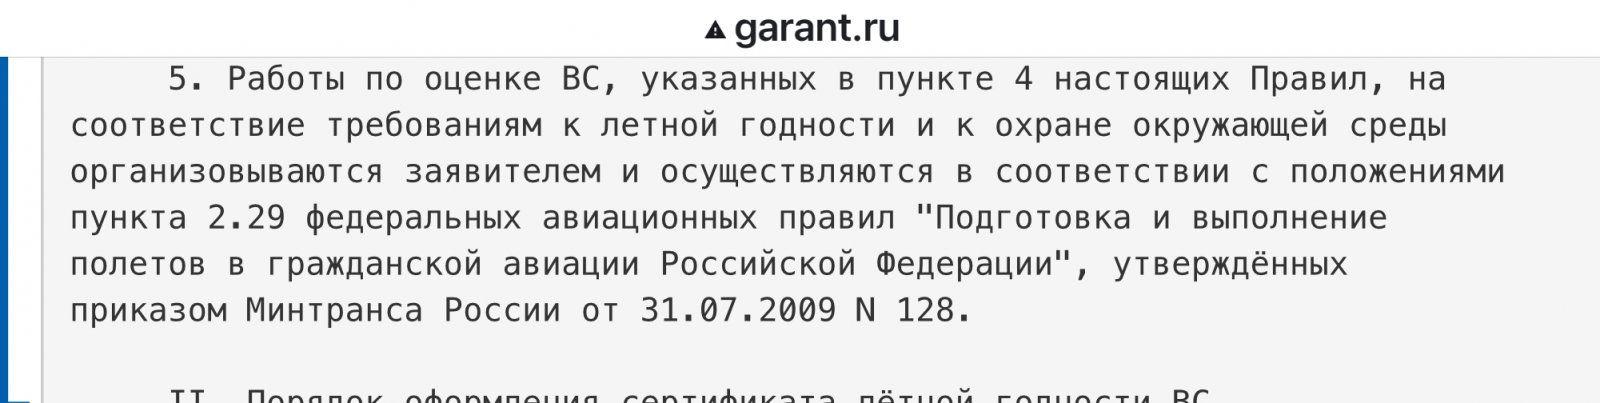 435D79F9-50C6-4701-8910-60842D1E4EF9.jpeg